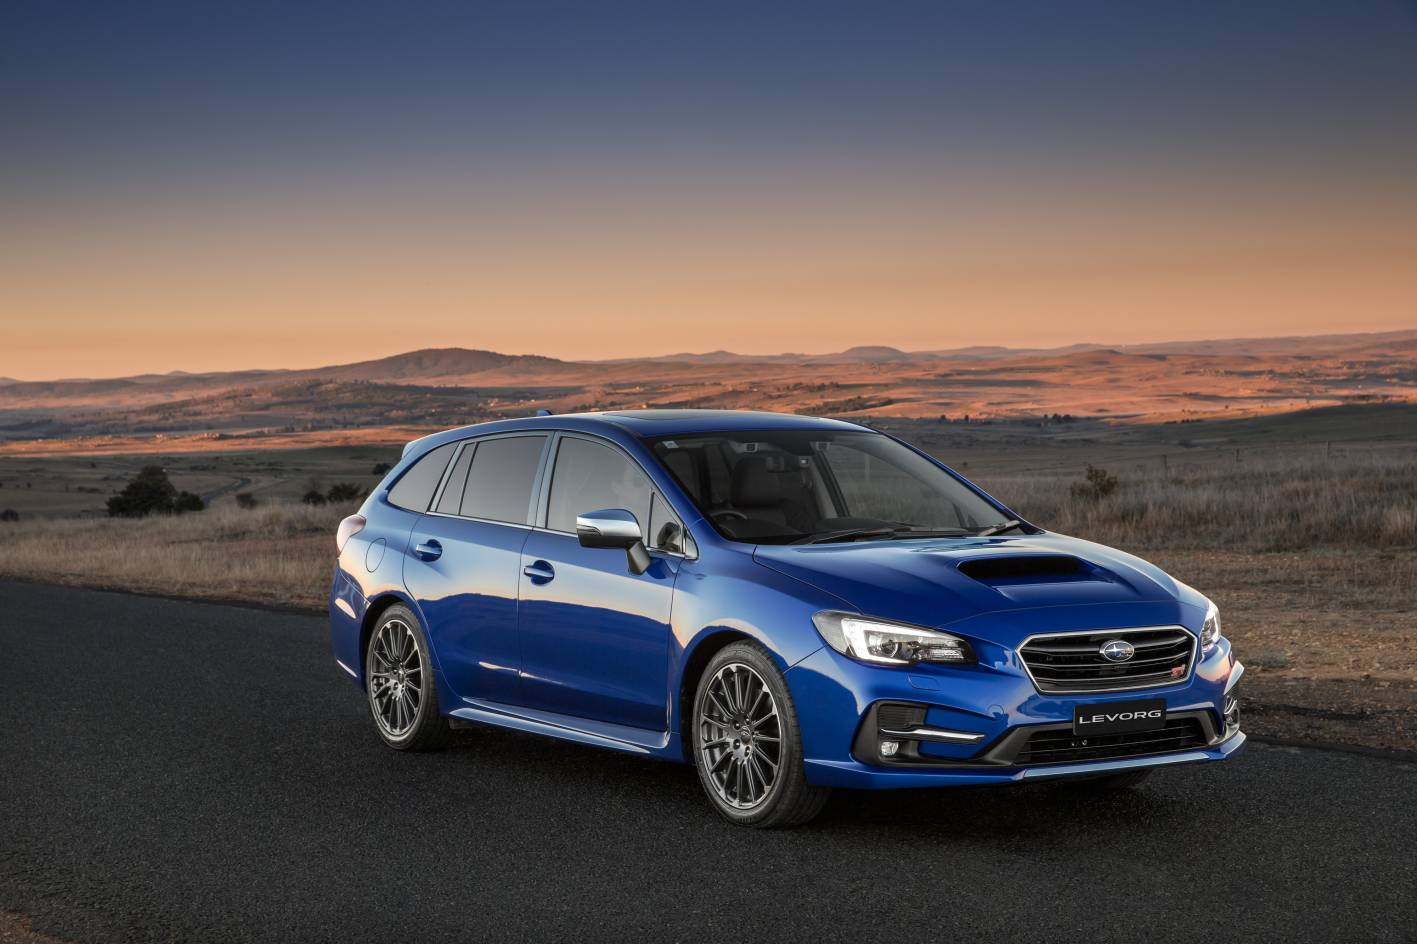 Subaru Outback Hybrid >> Subaru Levorg 1.6L Turbo added as new range-opener - ForceGT.com